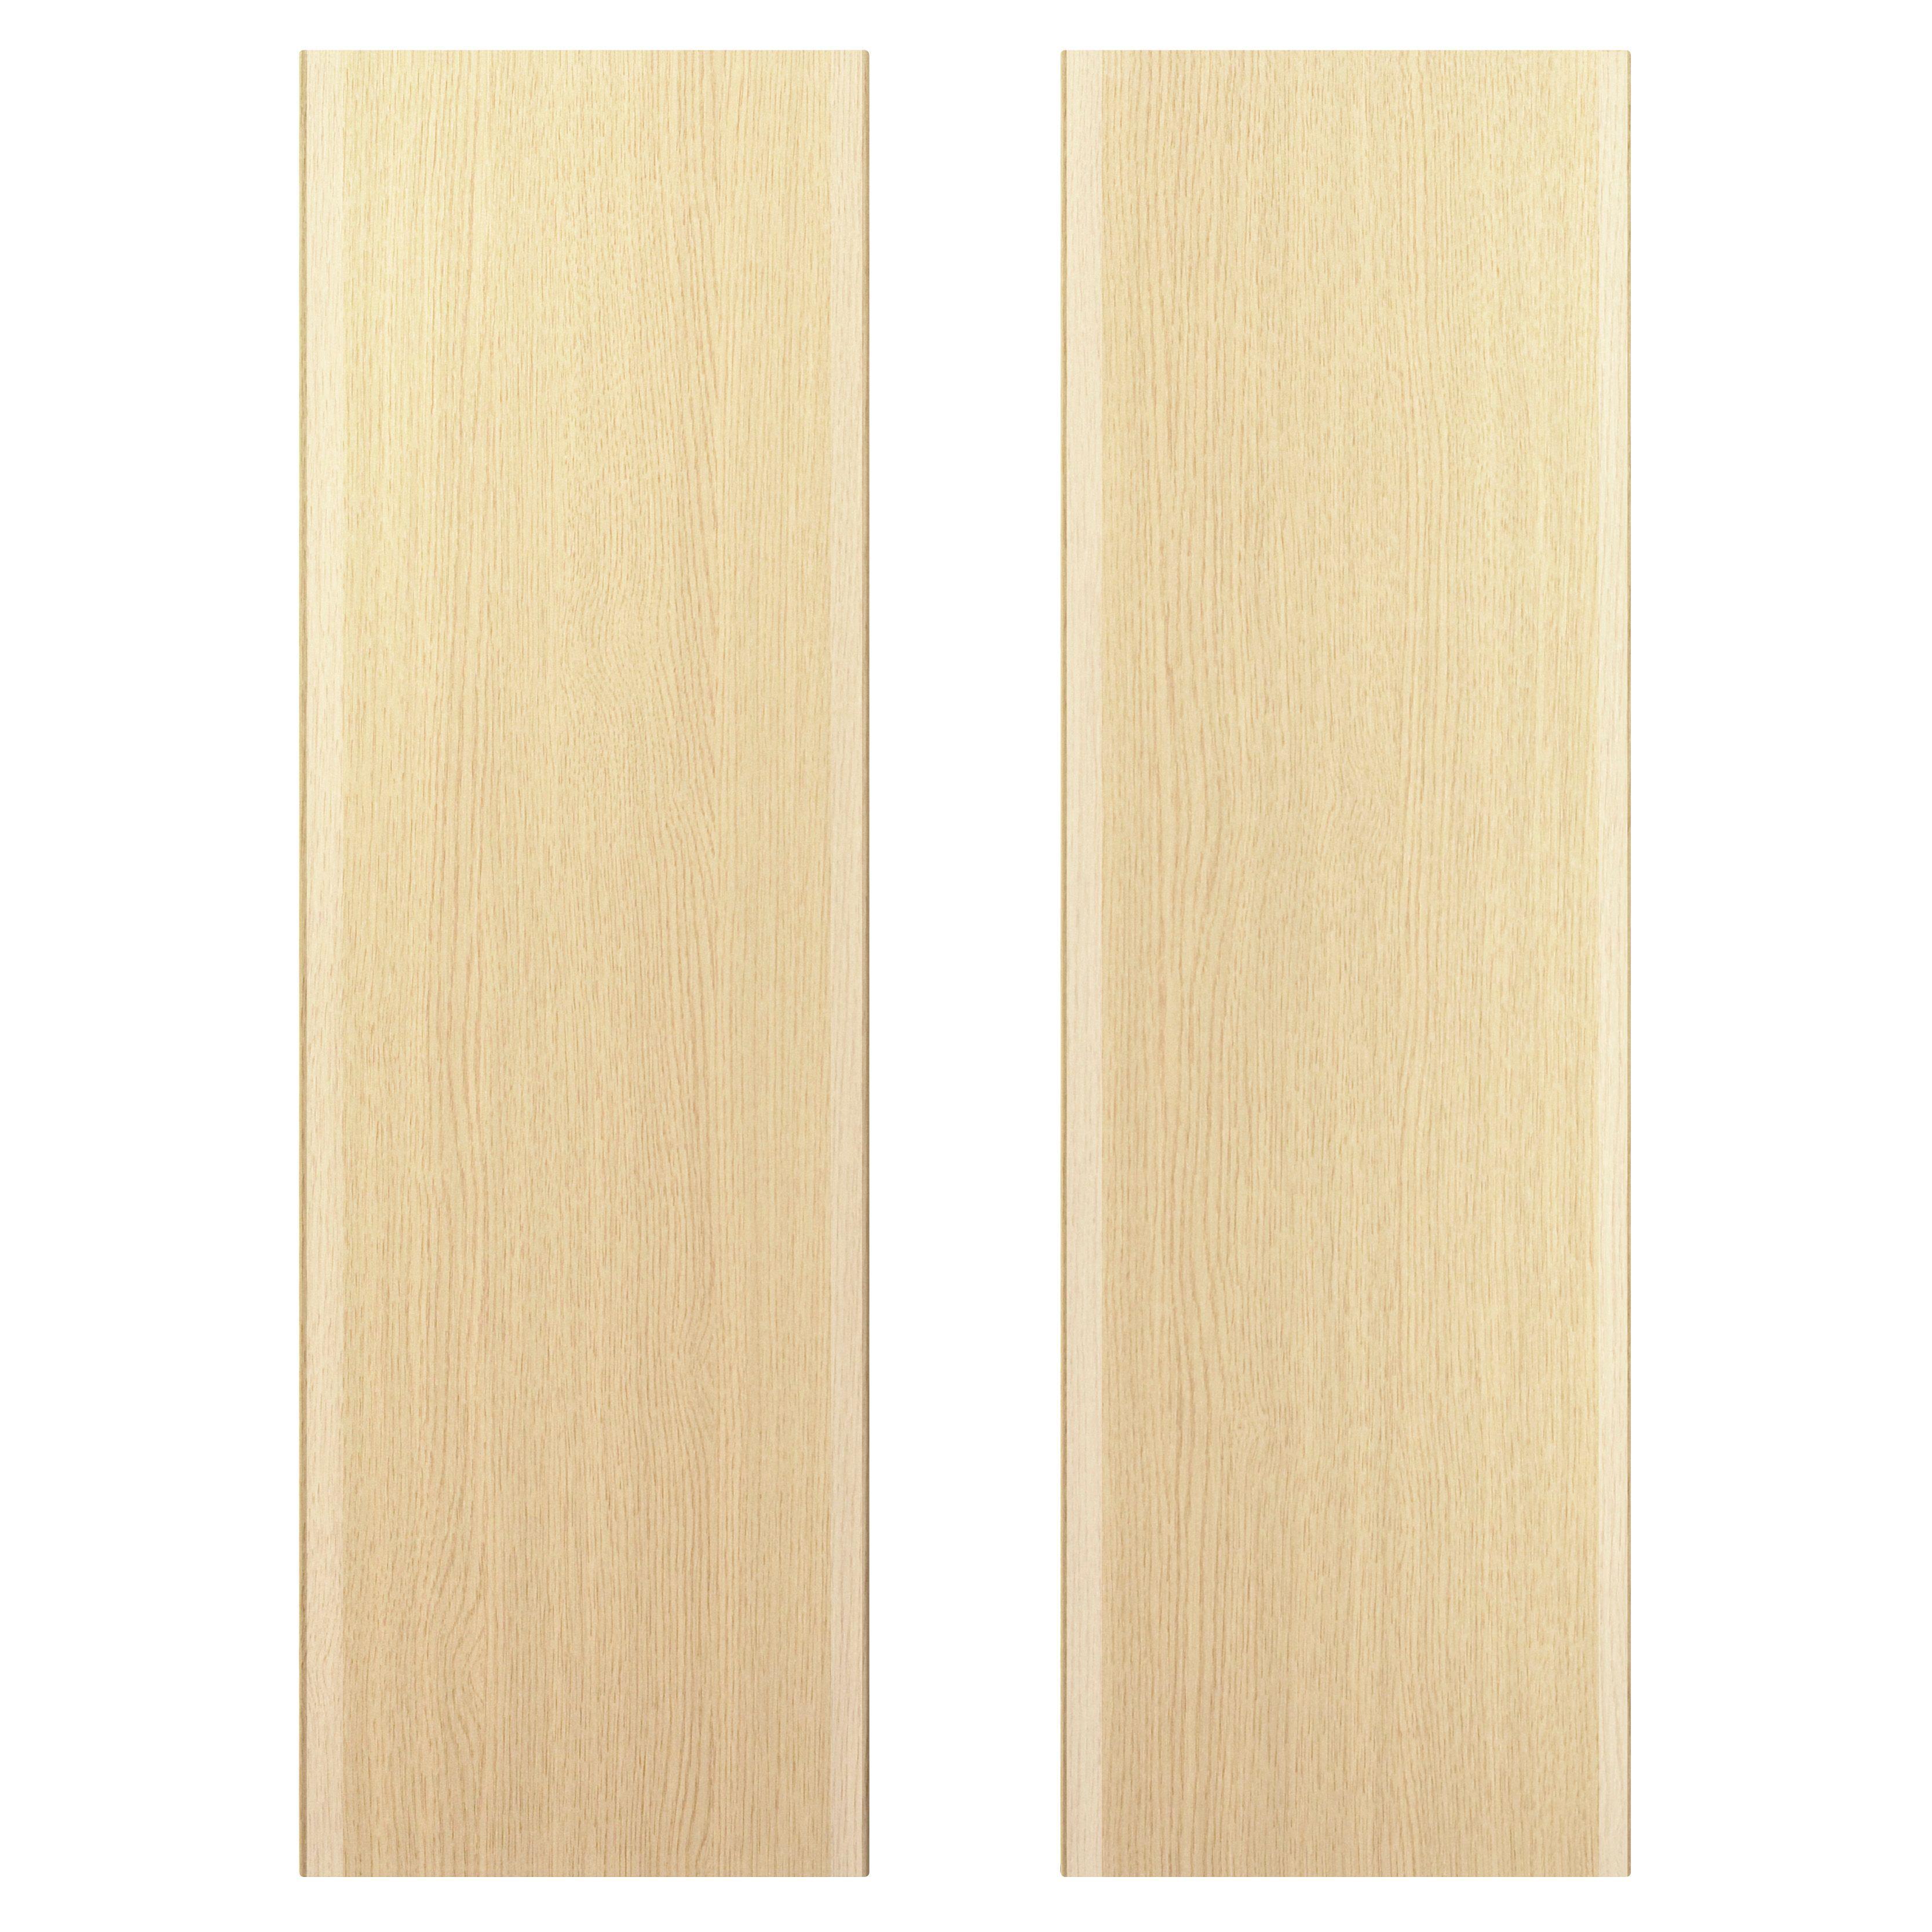 It Kitchens Sandford Textured Oak Effect Slab Larder Door (w)300mm, Set Of 2